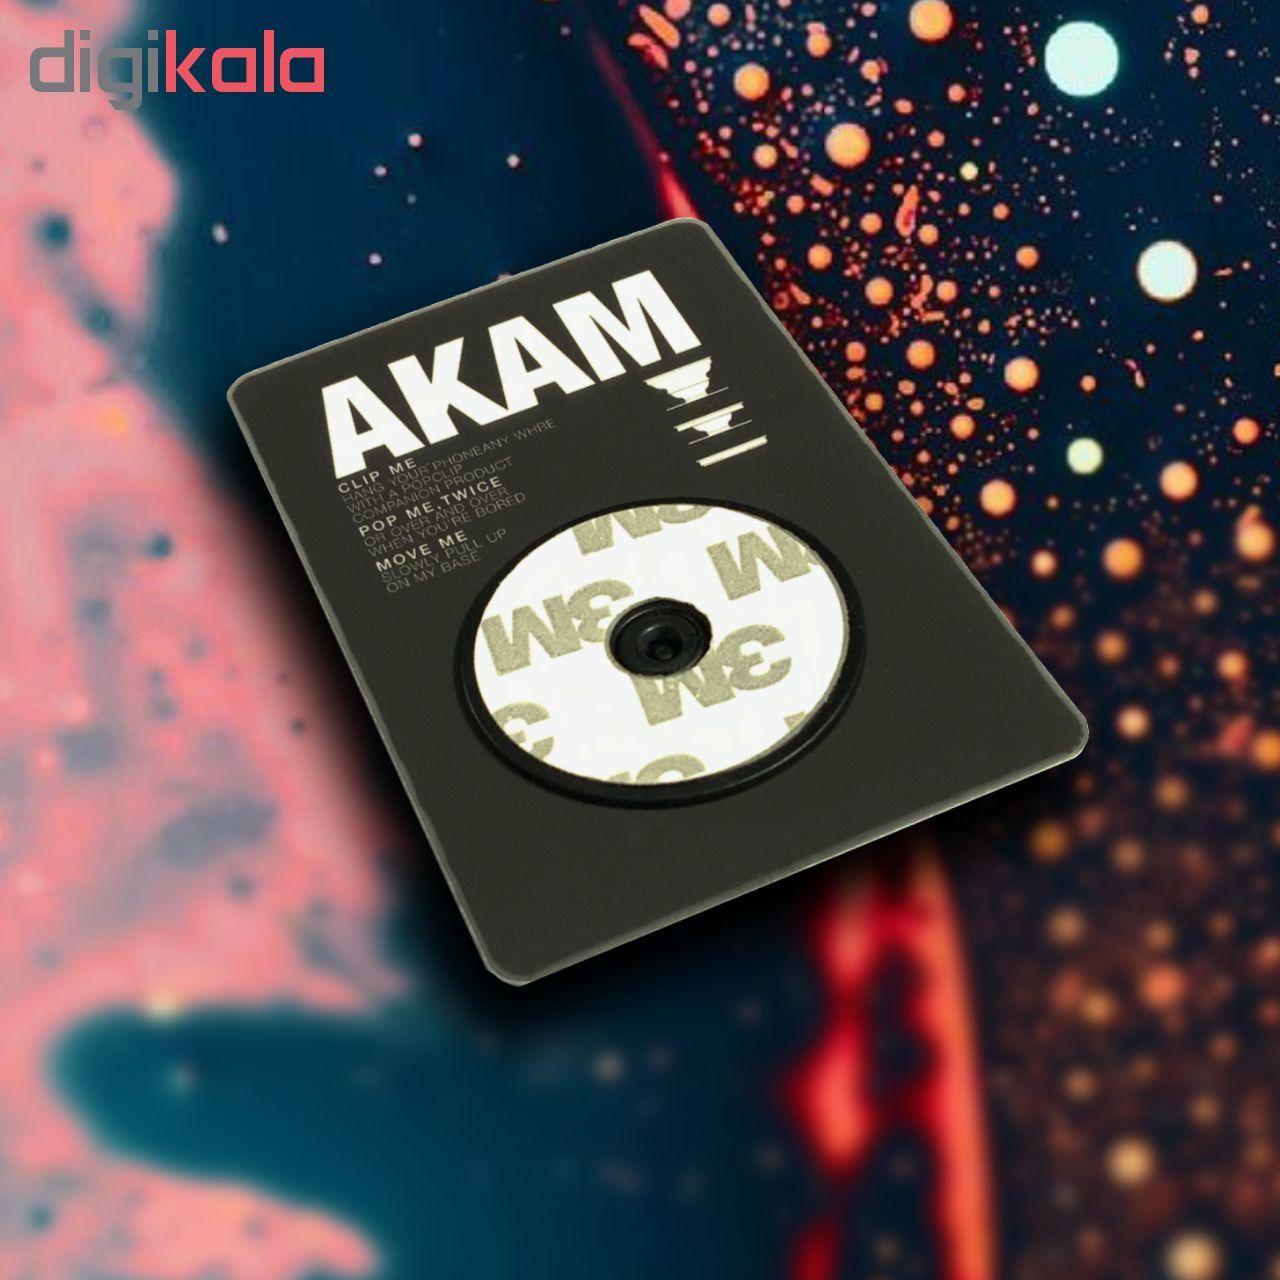 پایه نگهدارنده گوشی موبایل پاپ سوکت آکام مدل APS0284 main 1 3